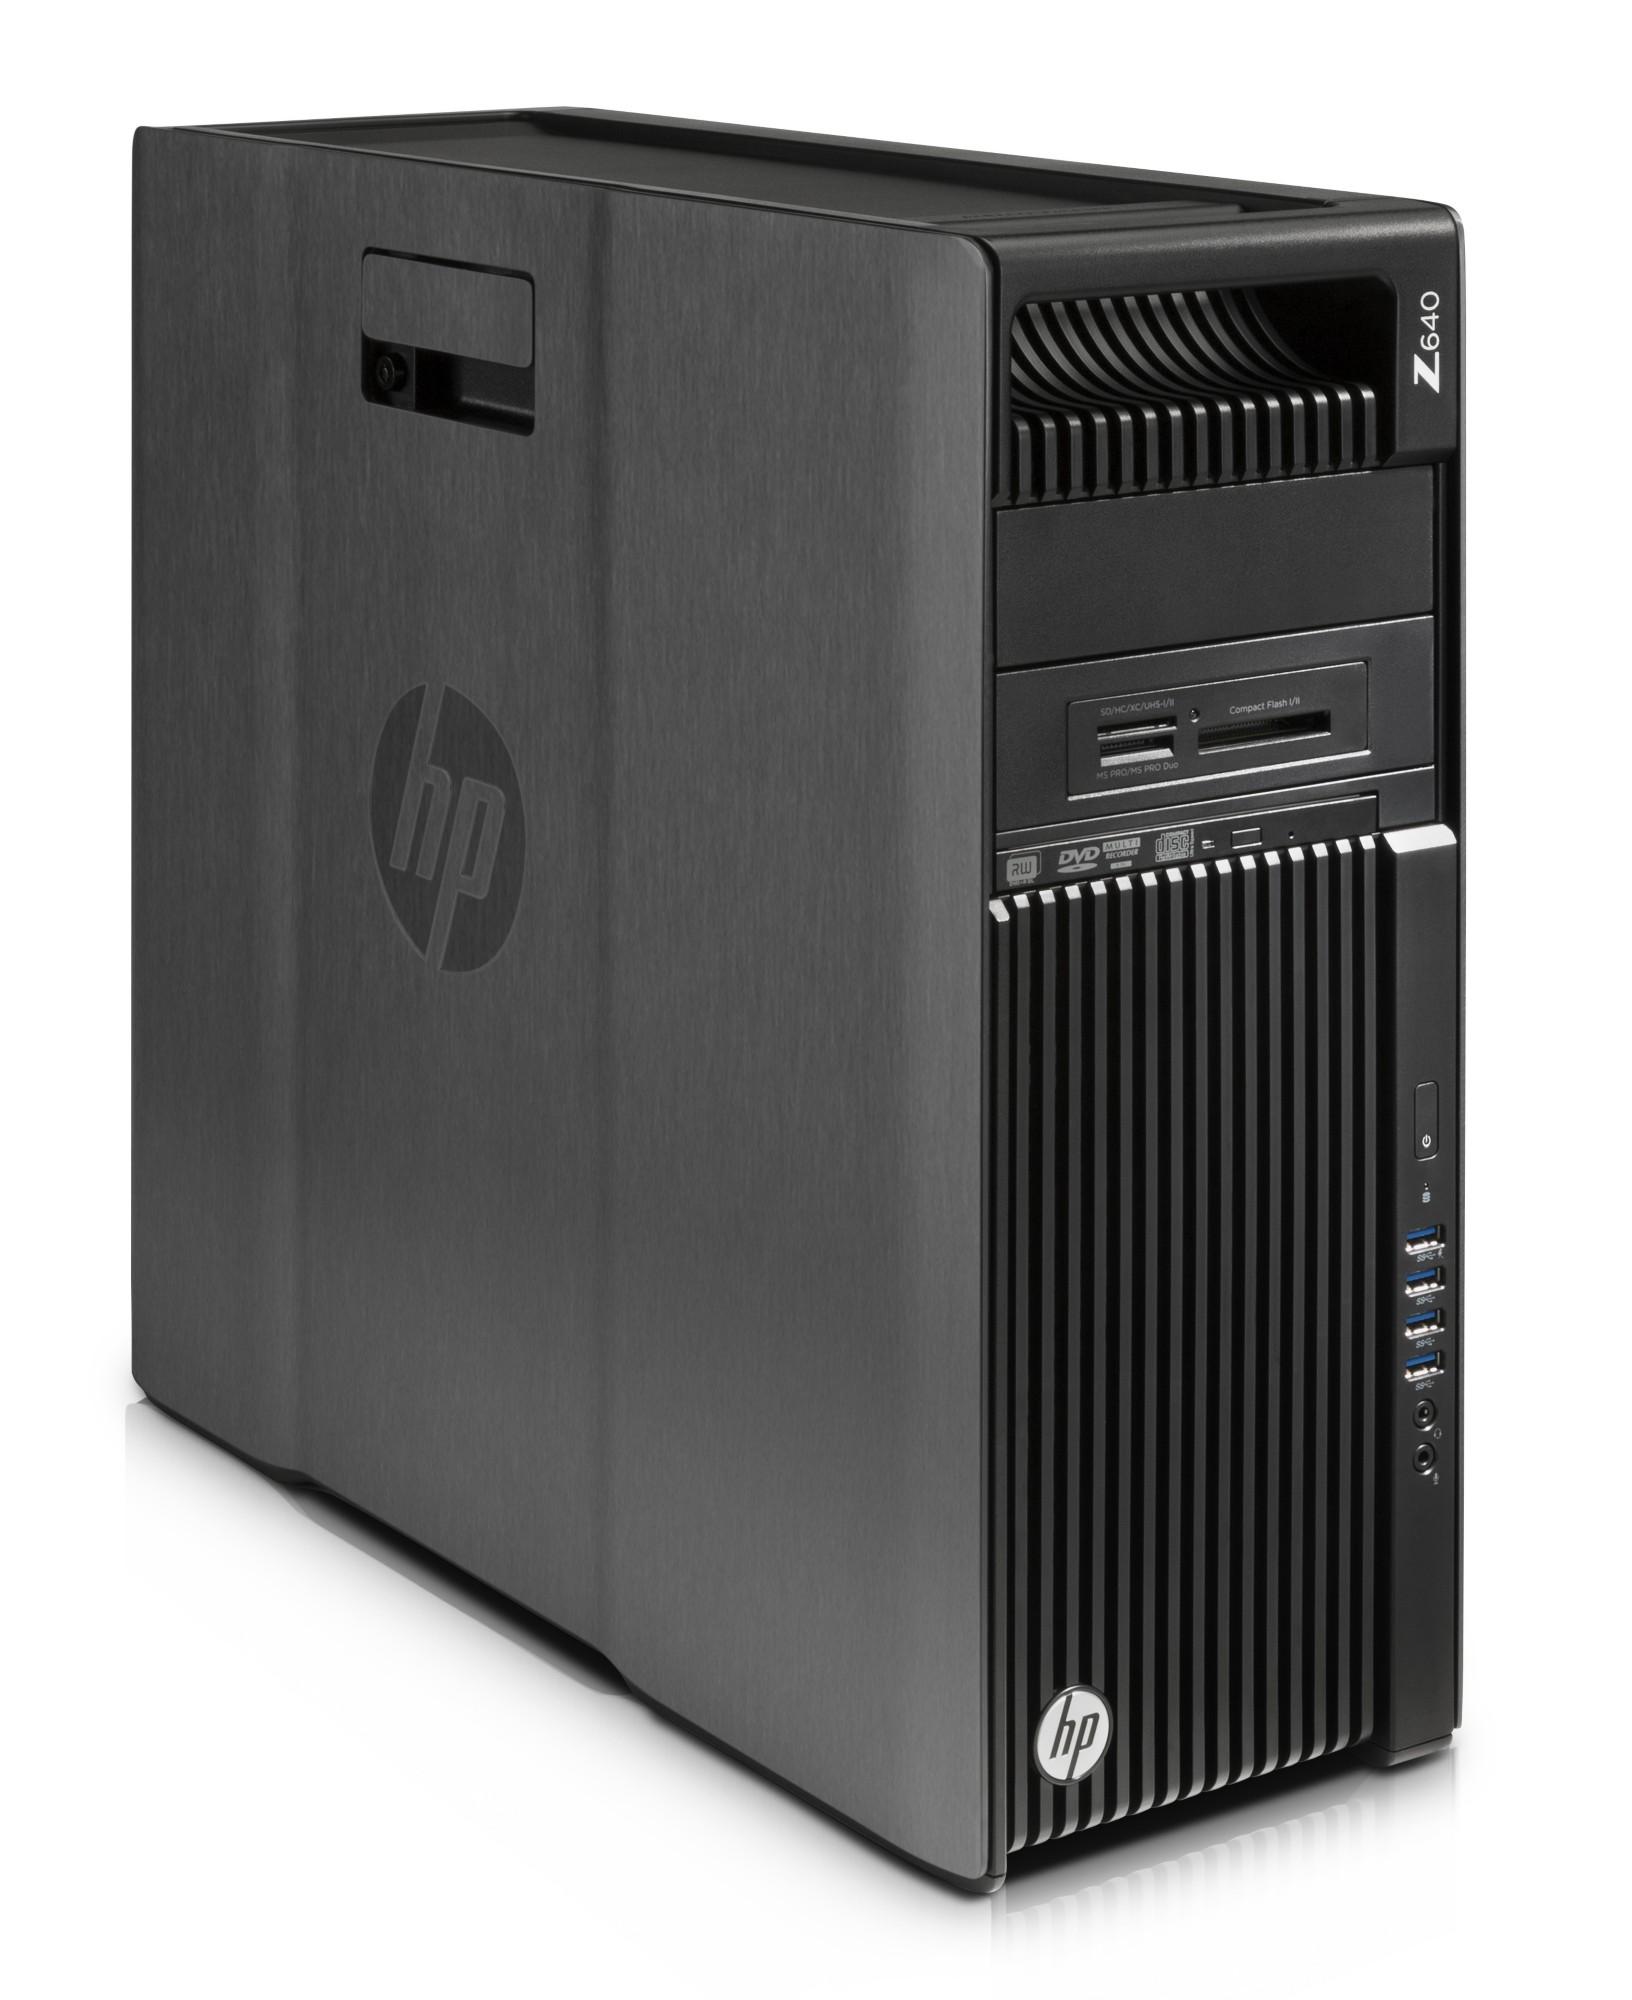 HP Z640 2.1GHz E5-2620V4 Mini Tower Black Workstation